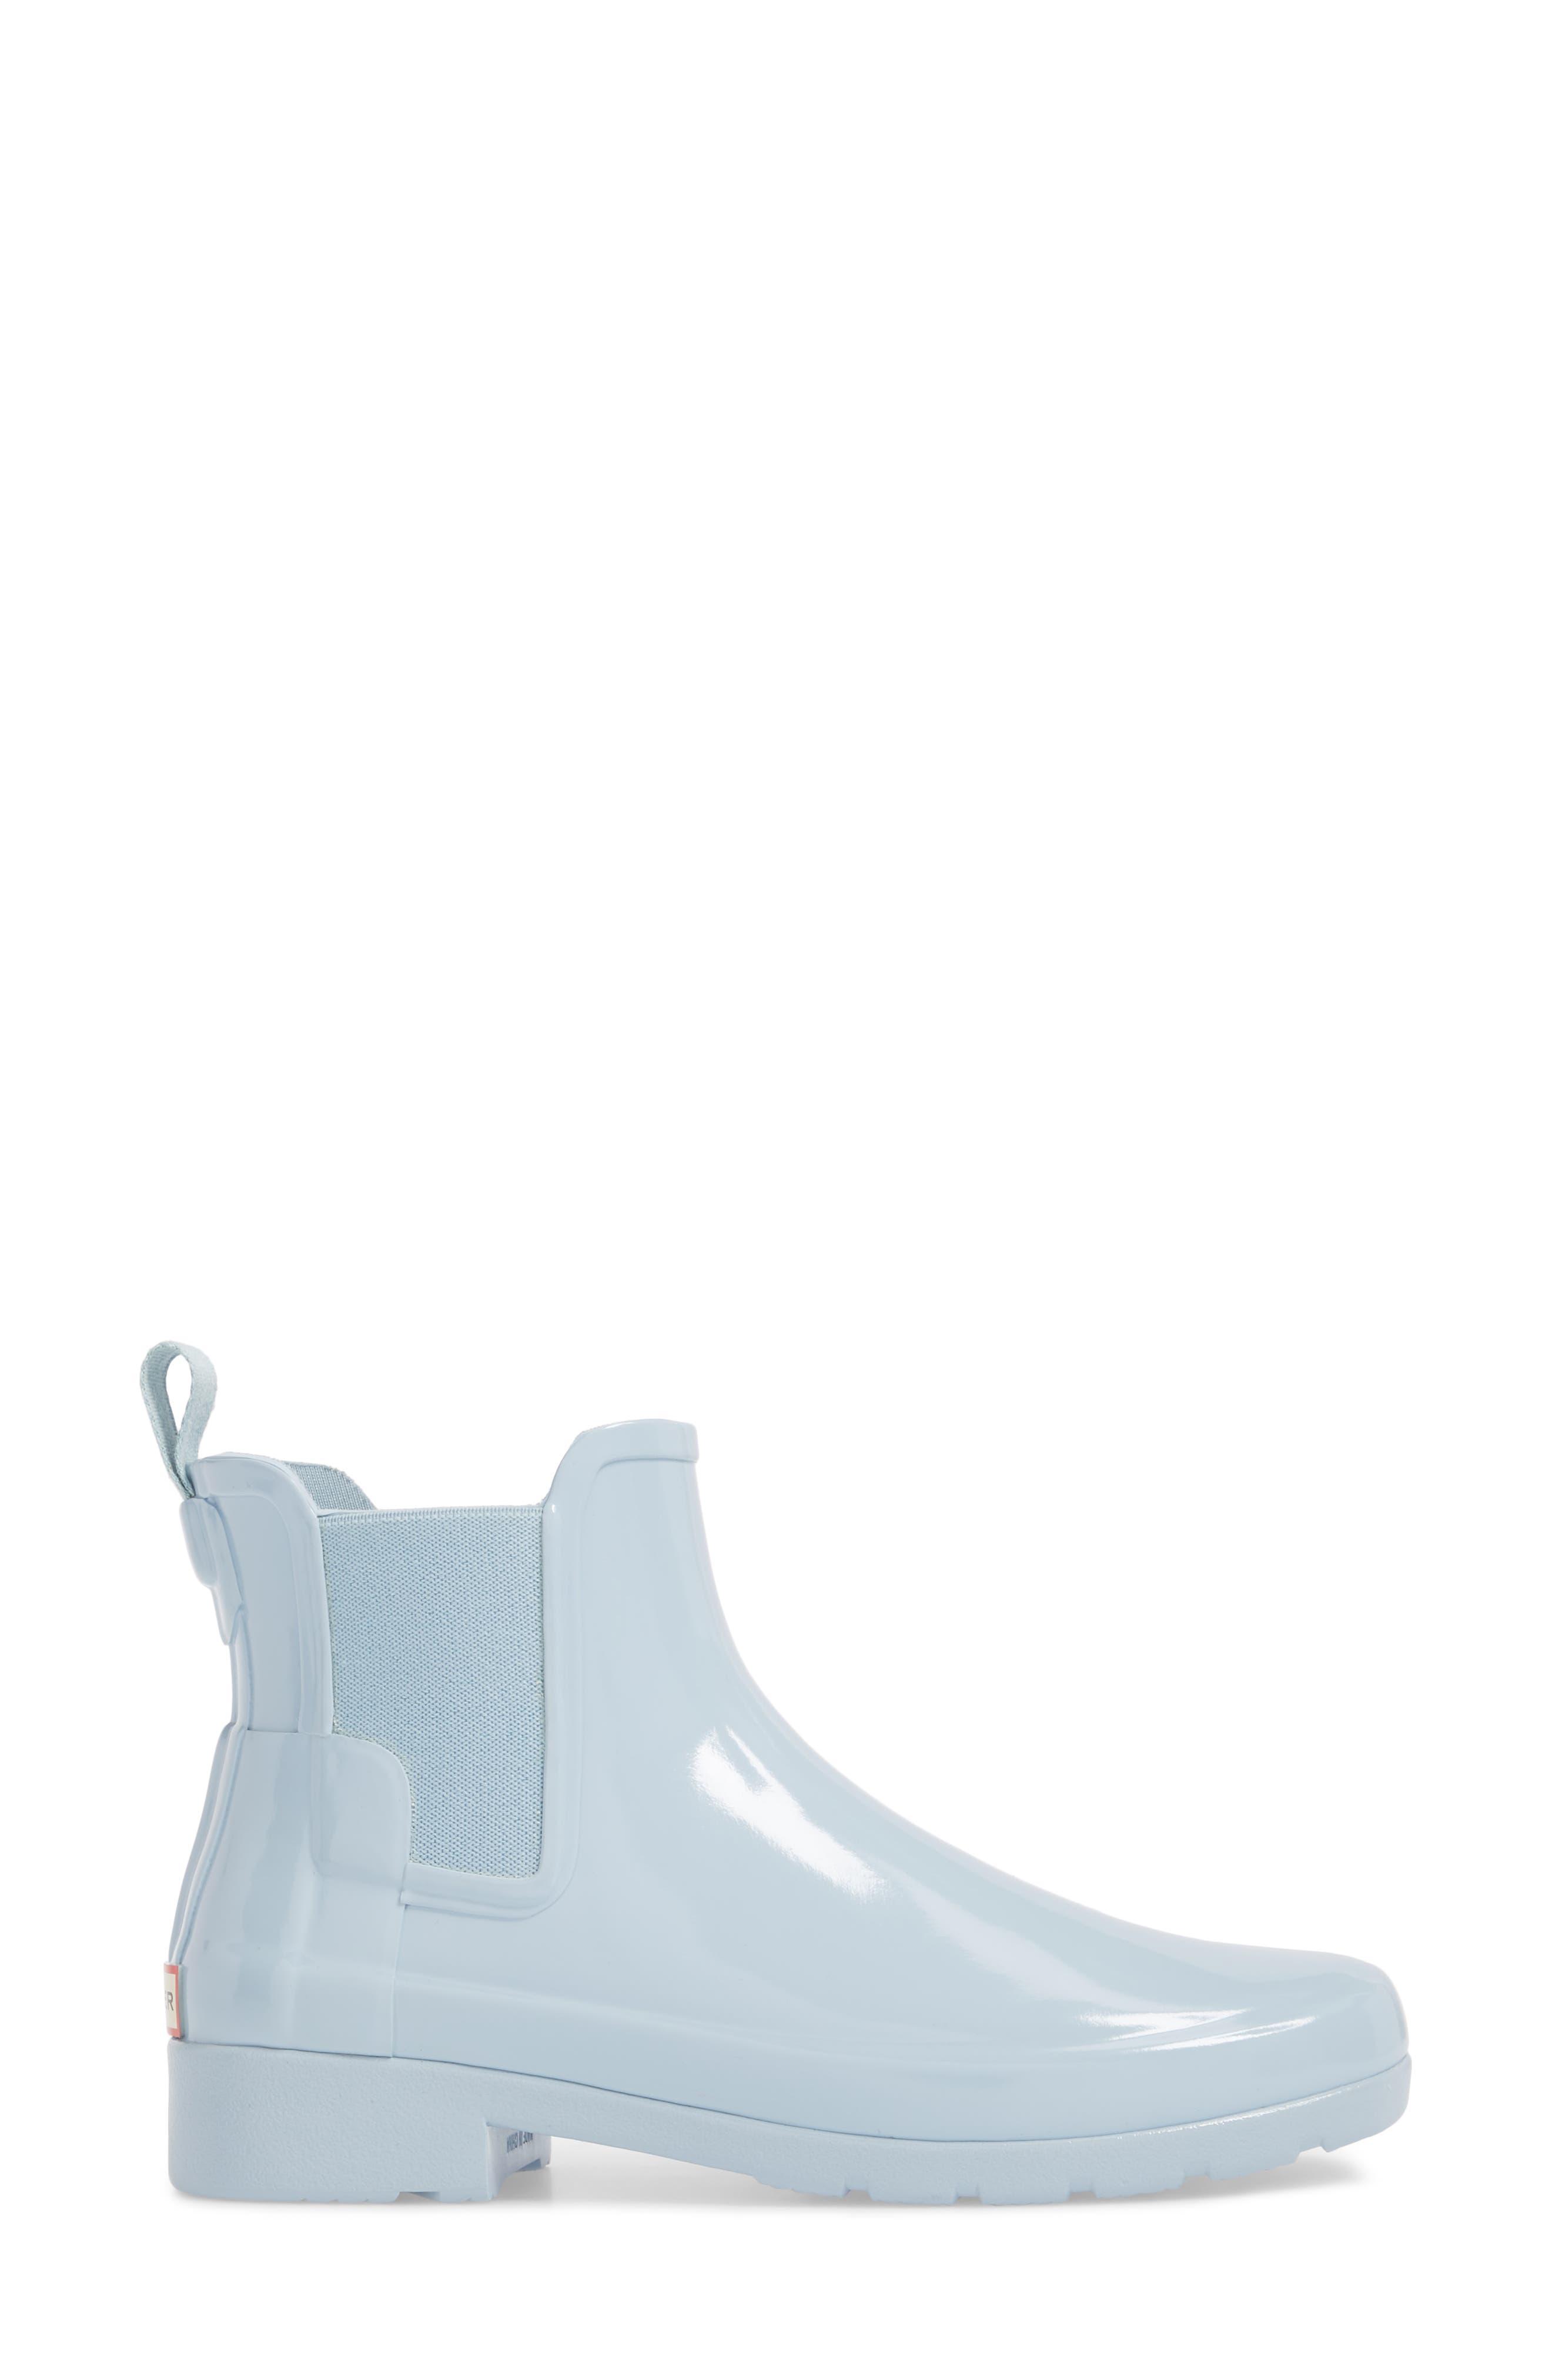 'Original Refined' Chelsea Rain Boot,                             Alternate thumbnail 3, color,                             Fountain Blue